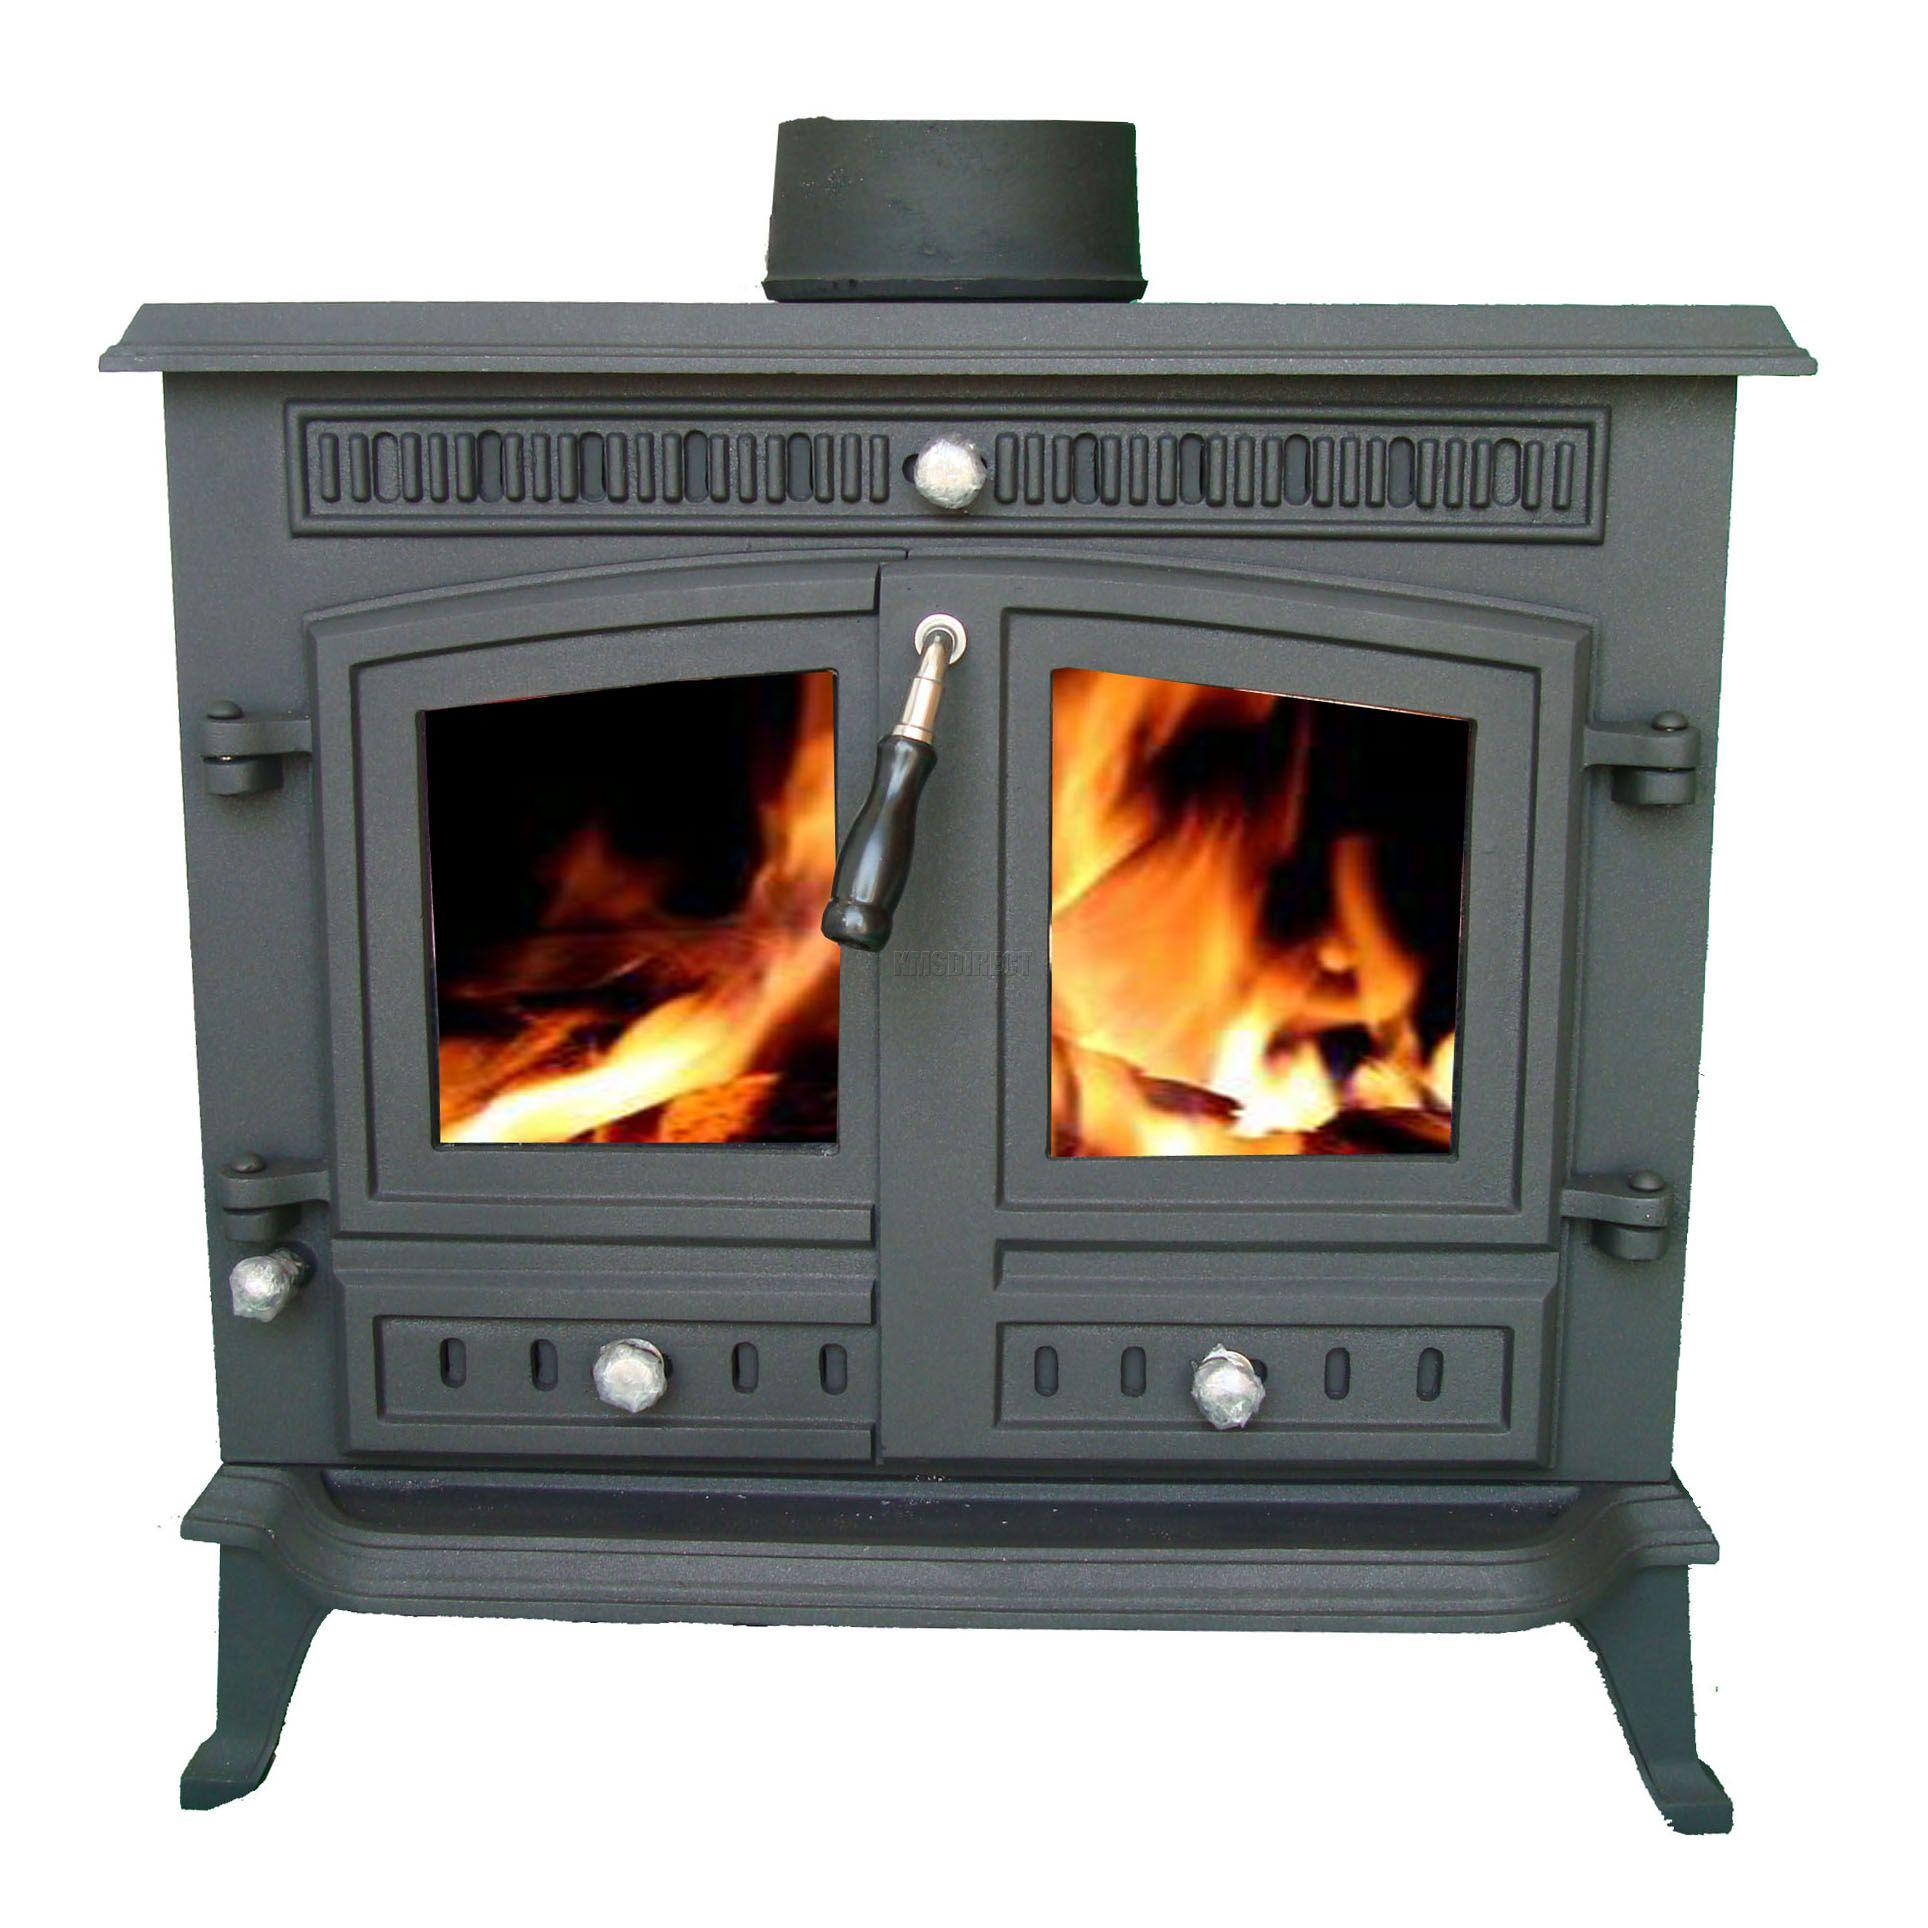 Multi Fuel Burner Reviews: NEW Cast Iron Log Burner MultiFuel Wood Burning 13 Kw